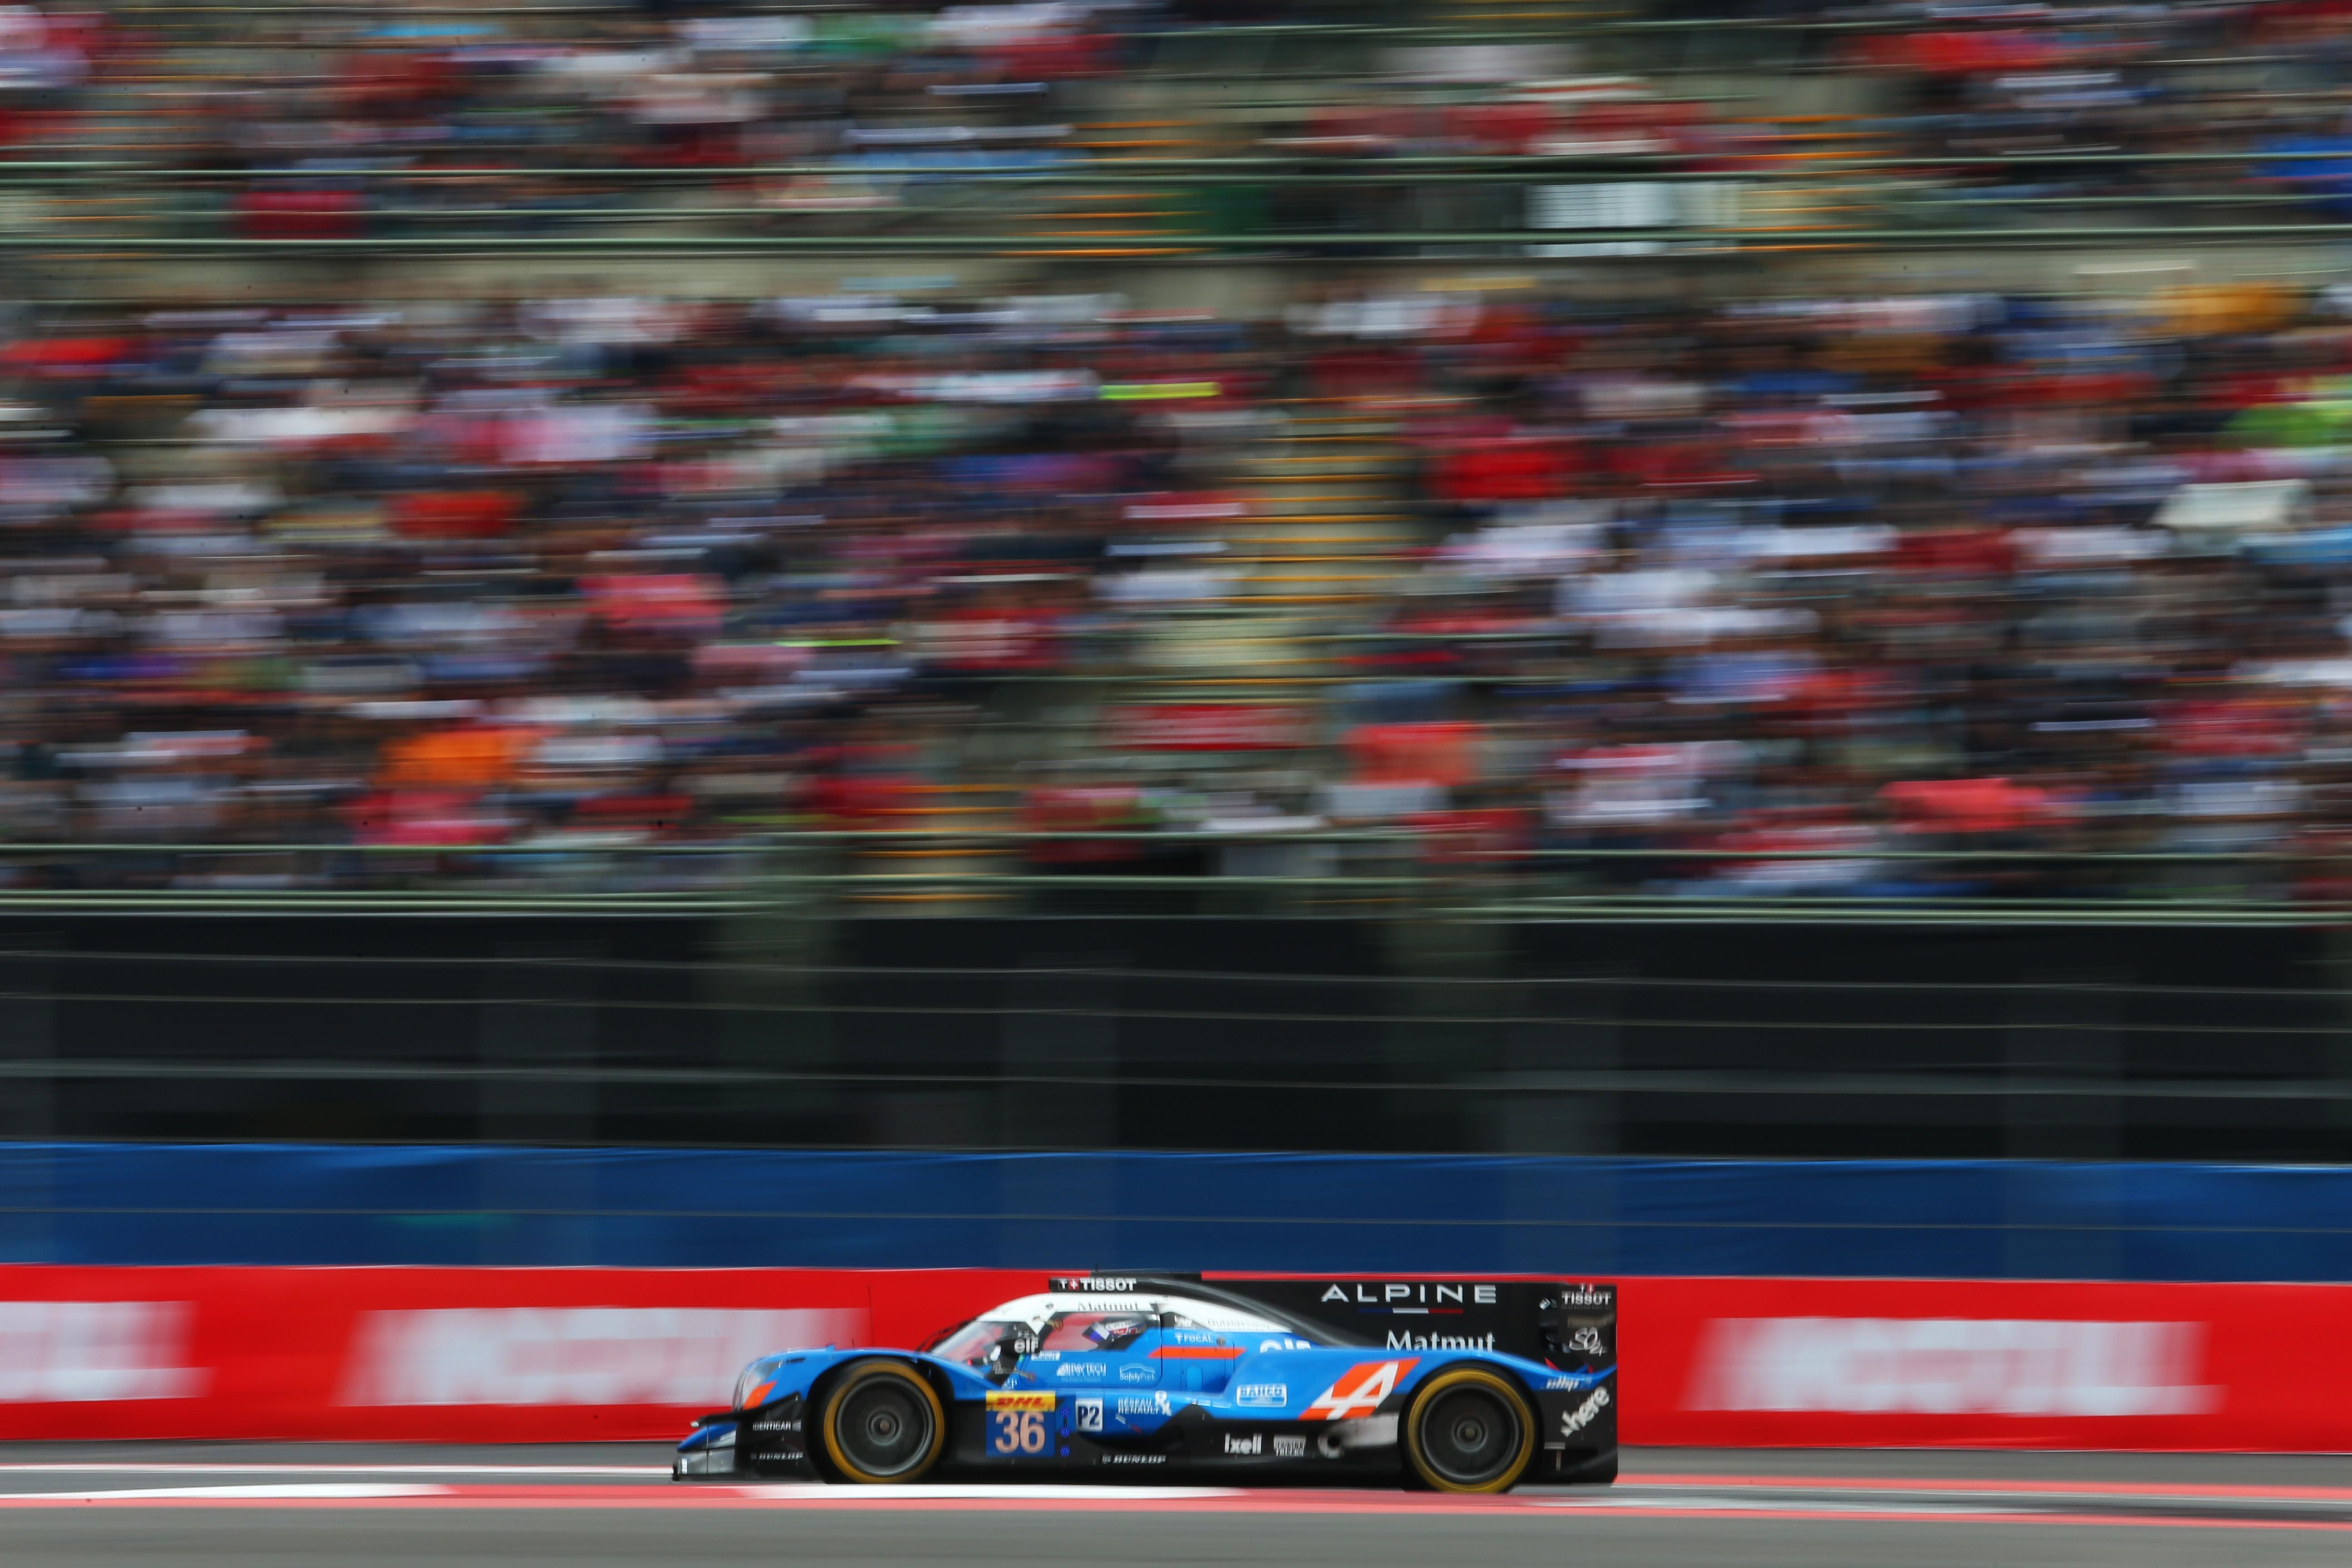 Motor Racing Fia World Endurance Championship Wec Round 5 Mexico City, Mexico